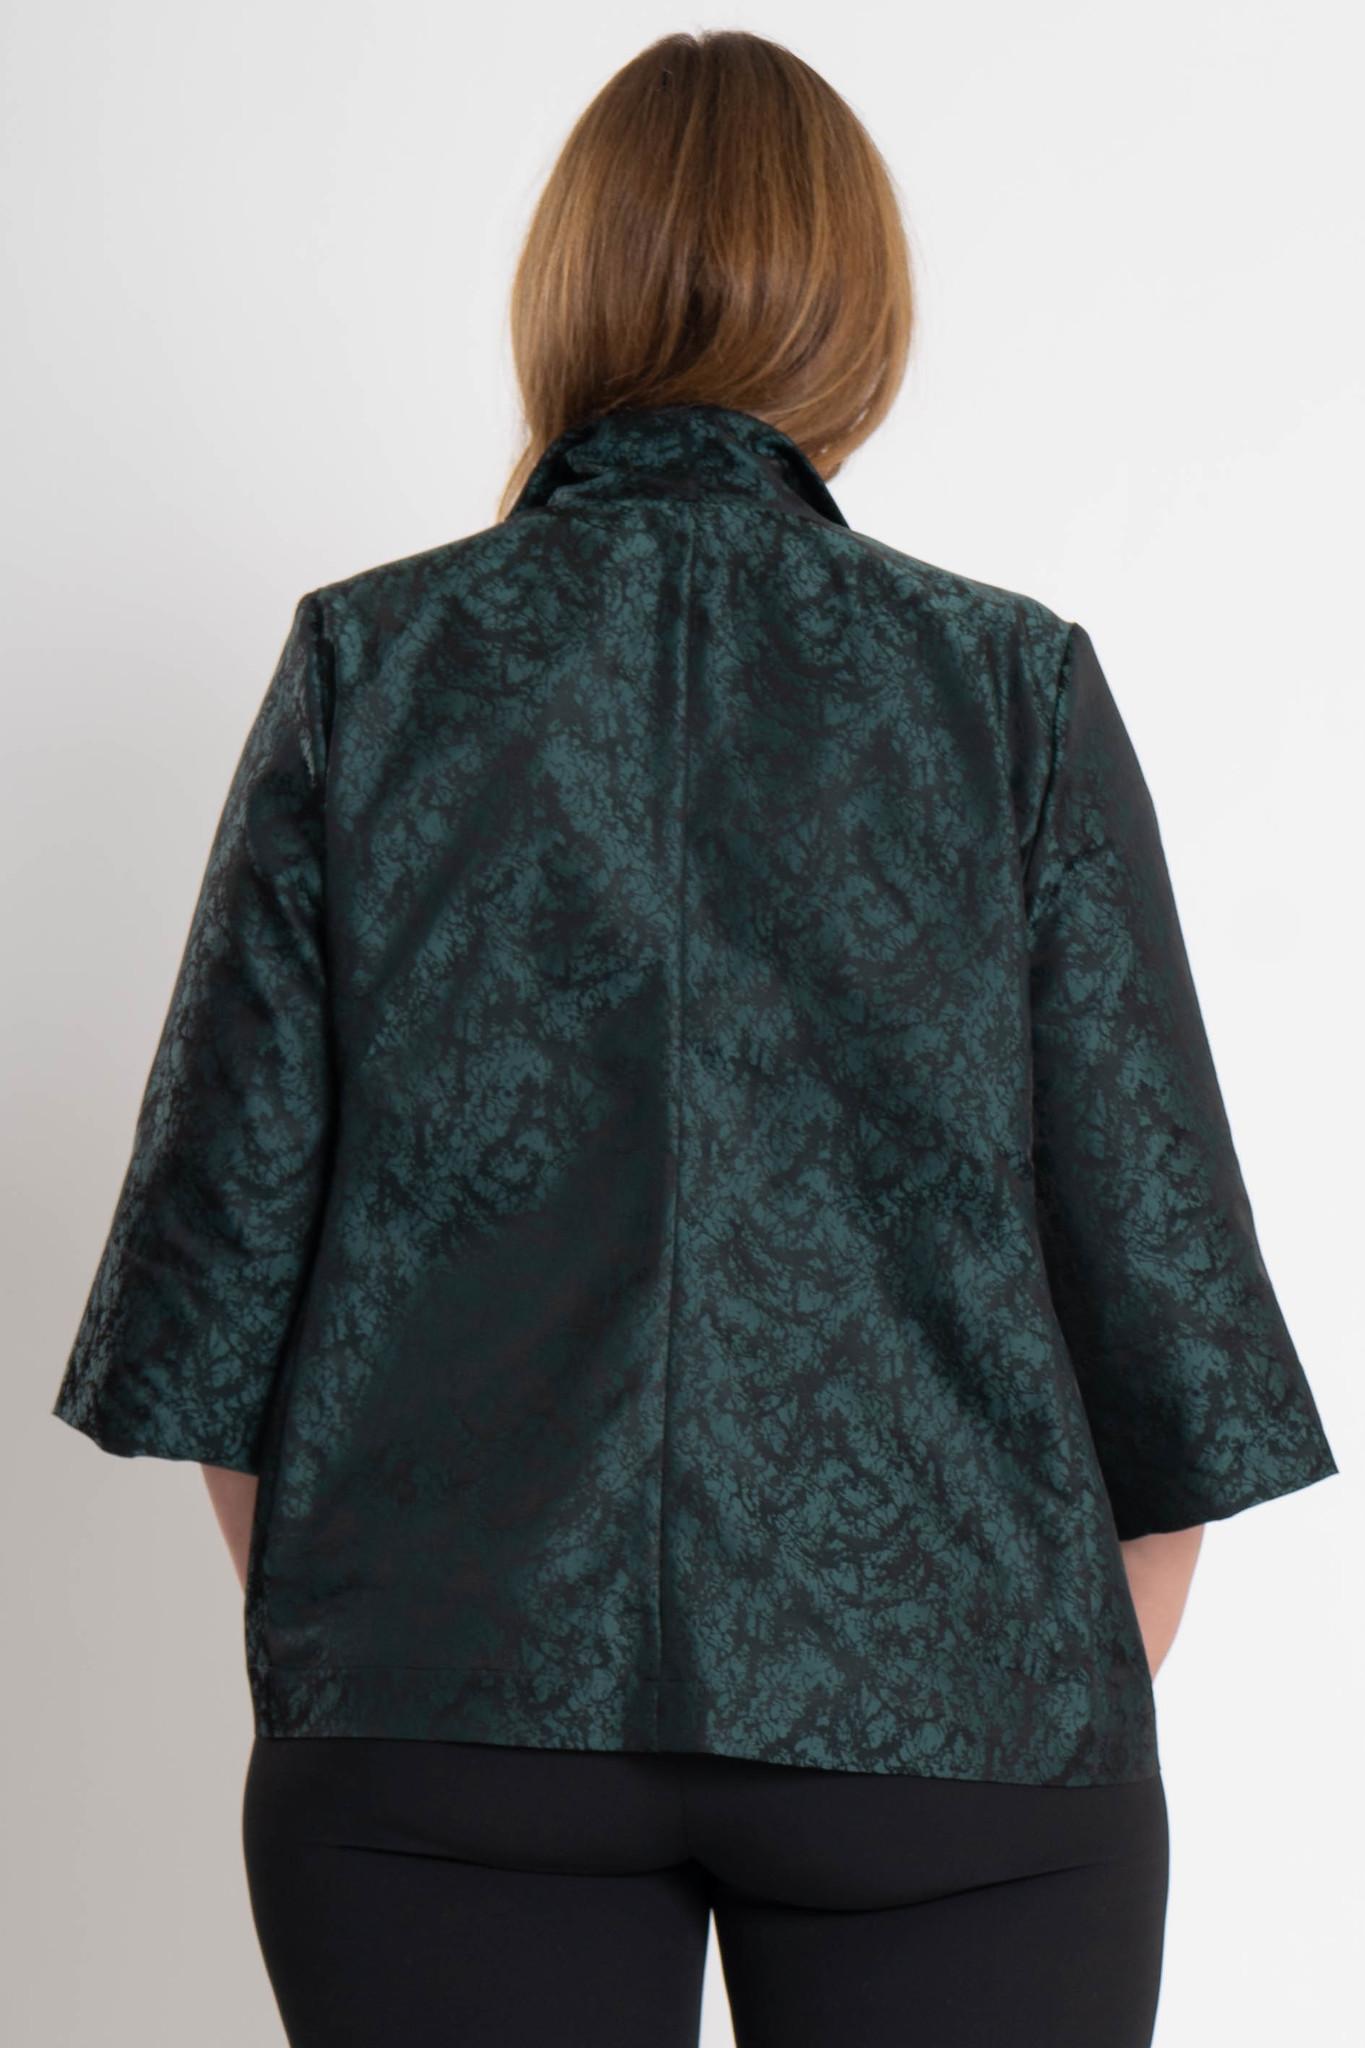 HISA Jacke aus Polyester Jacquard-4